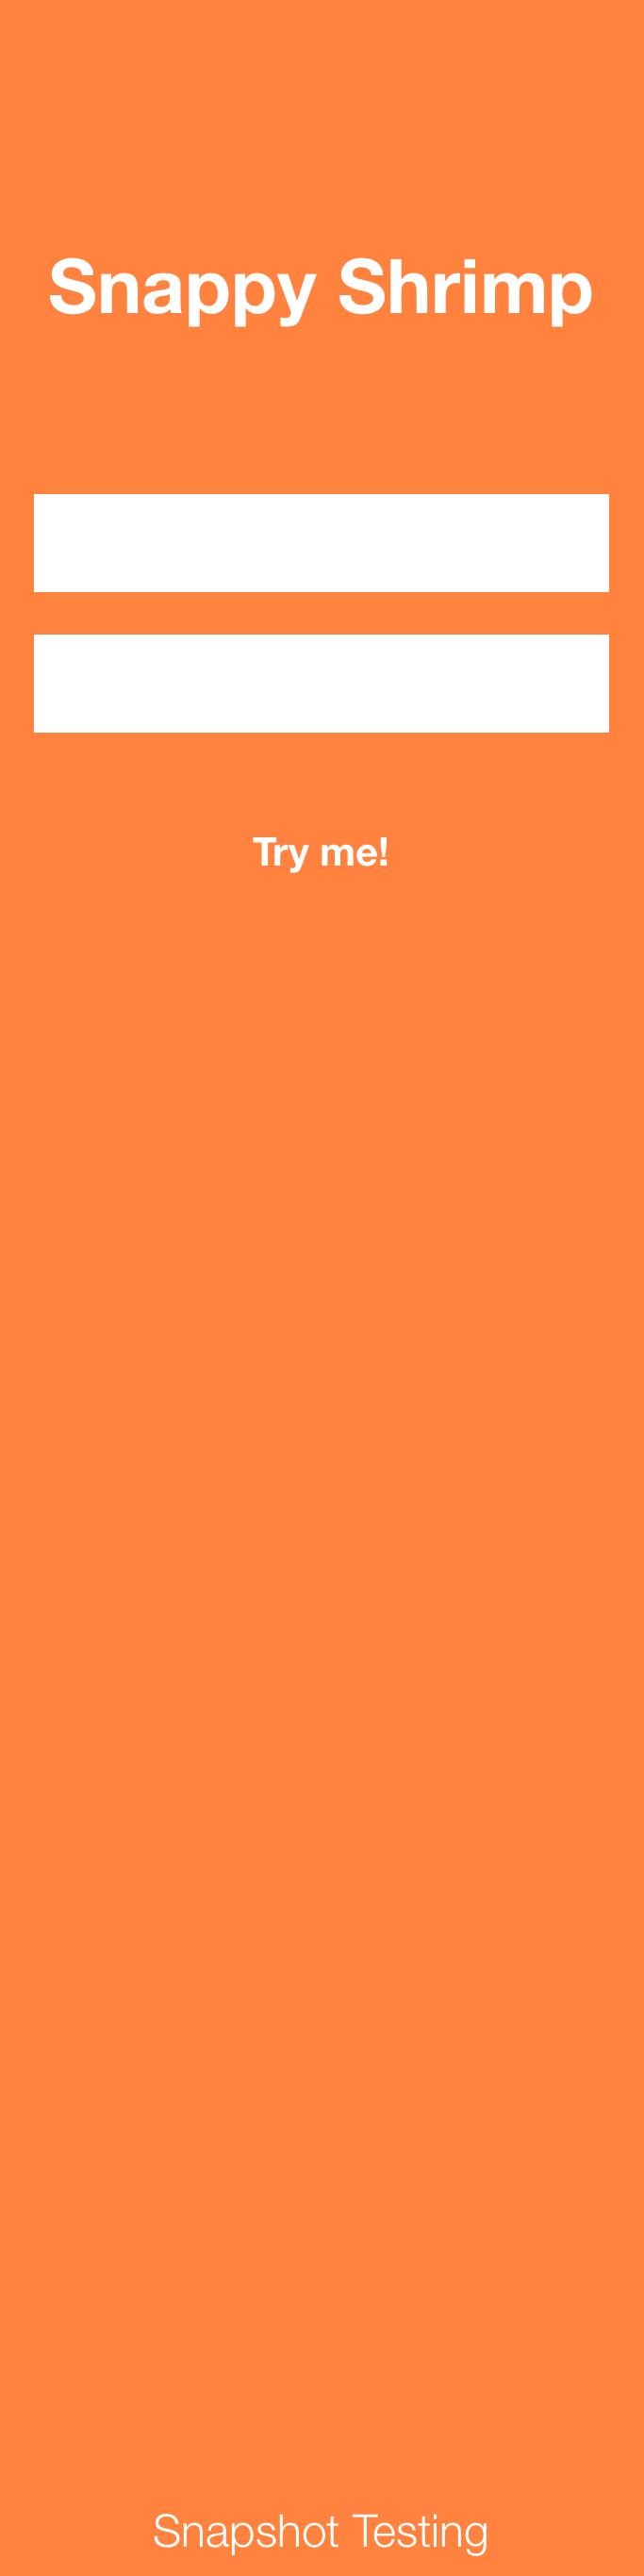 testexample_ipad_pro12_portrait_splitview_one_third_ios_11 2 2x